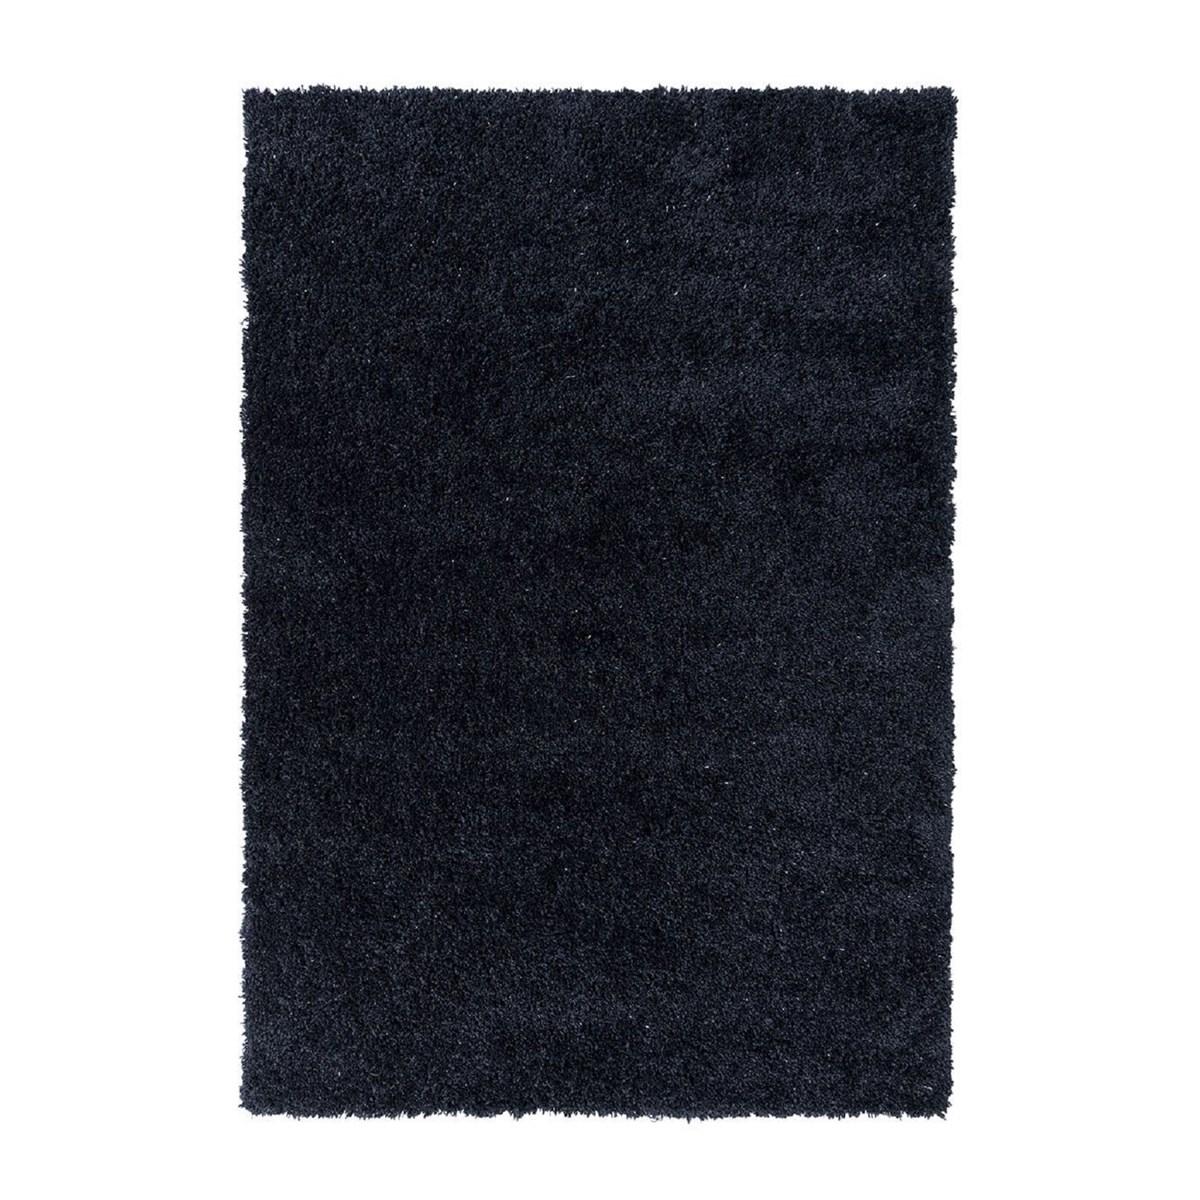 Tapis shaggy en Polyester Bleu nuit 200x290 cm